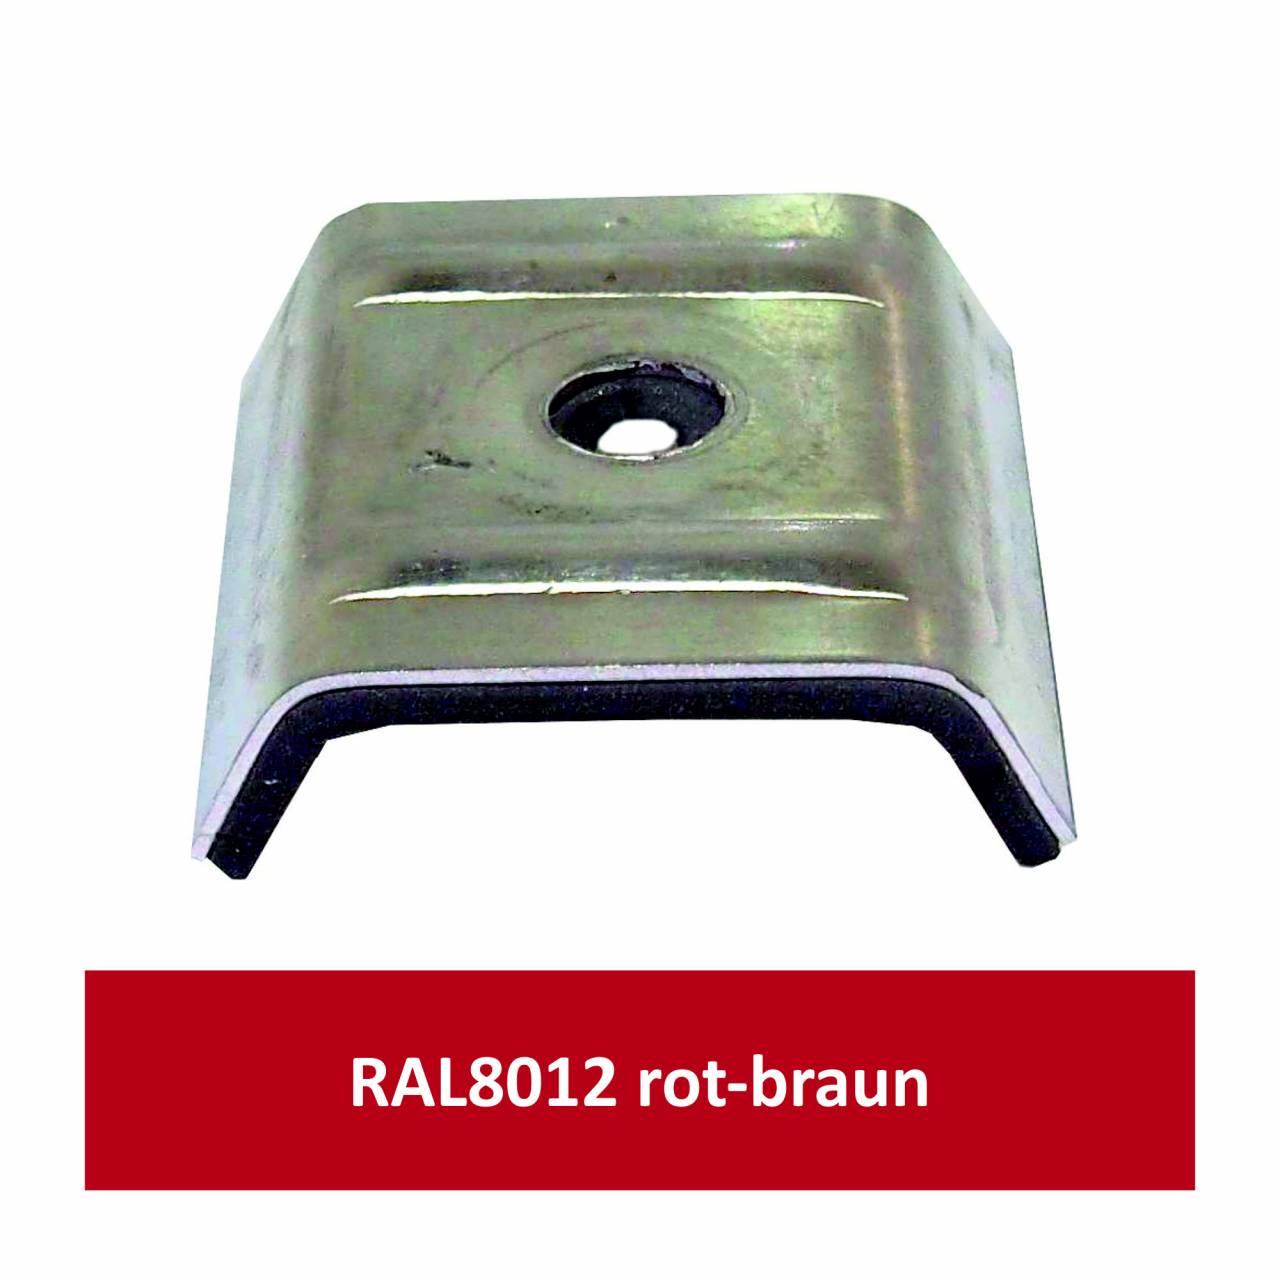 Kalotten für N1000T, Alu RAL8012 rotbraun/ Pck a 100 Stück